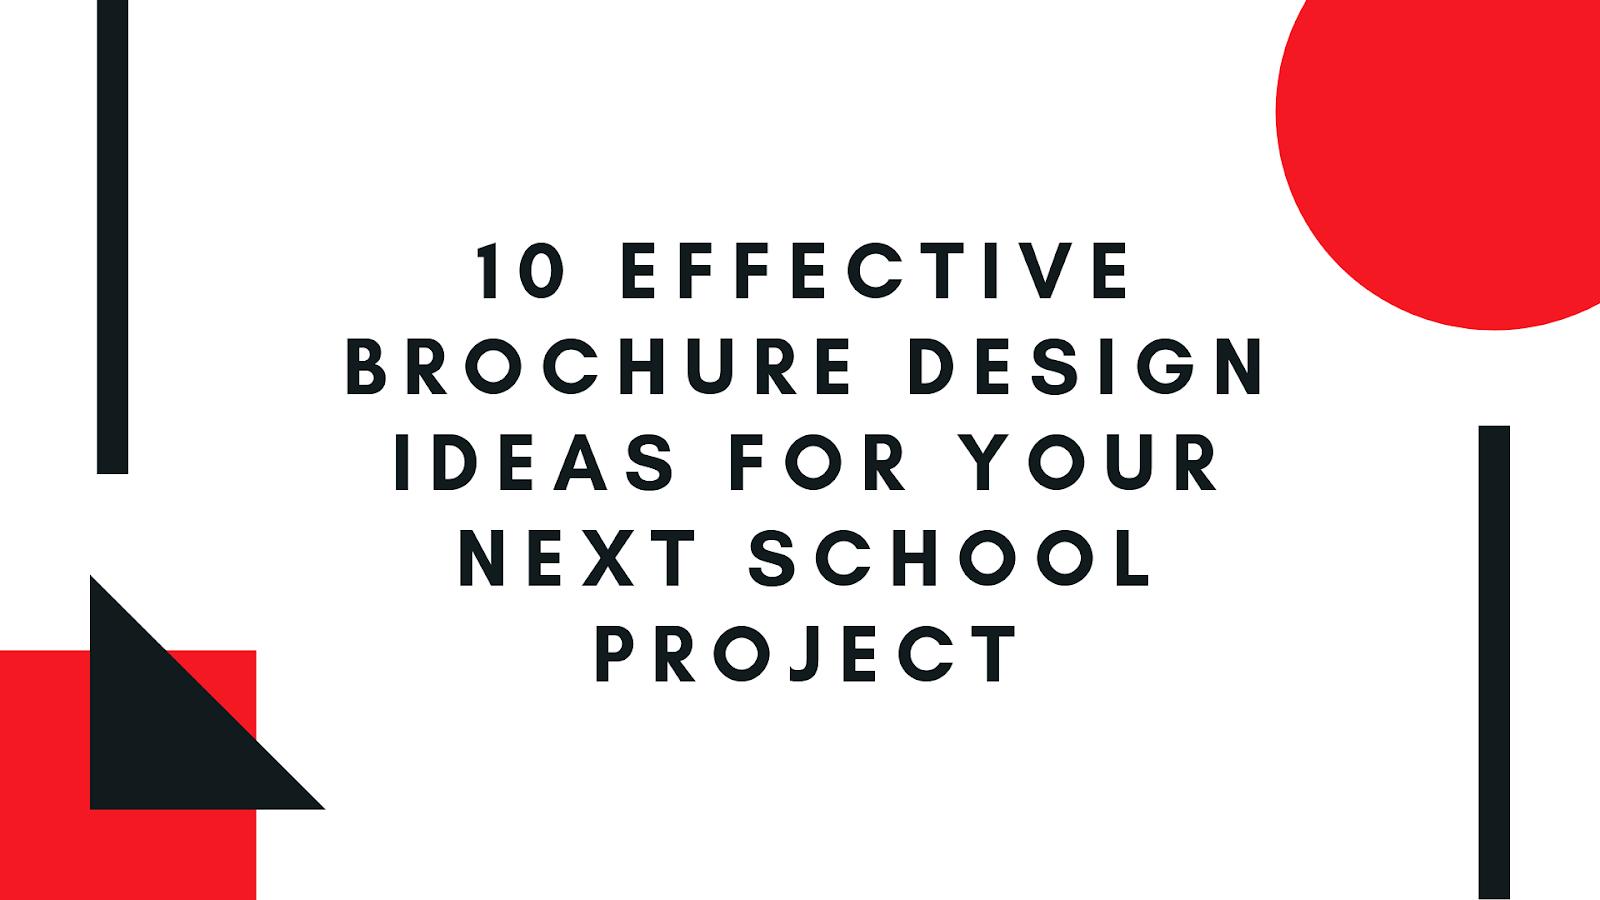 10 Effective Brochure Design Ideas For Your Next School Project